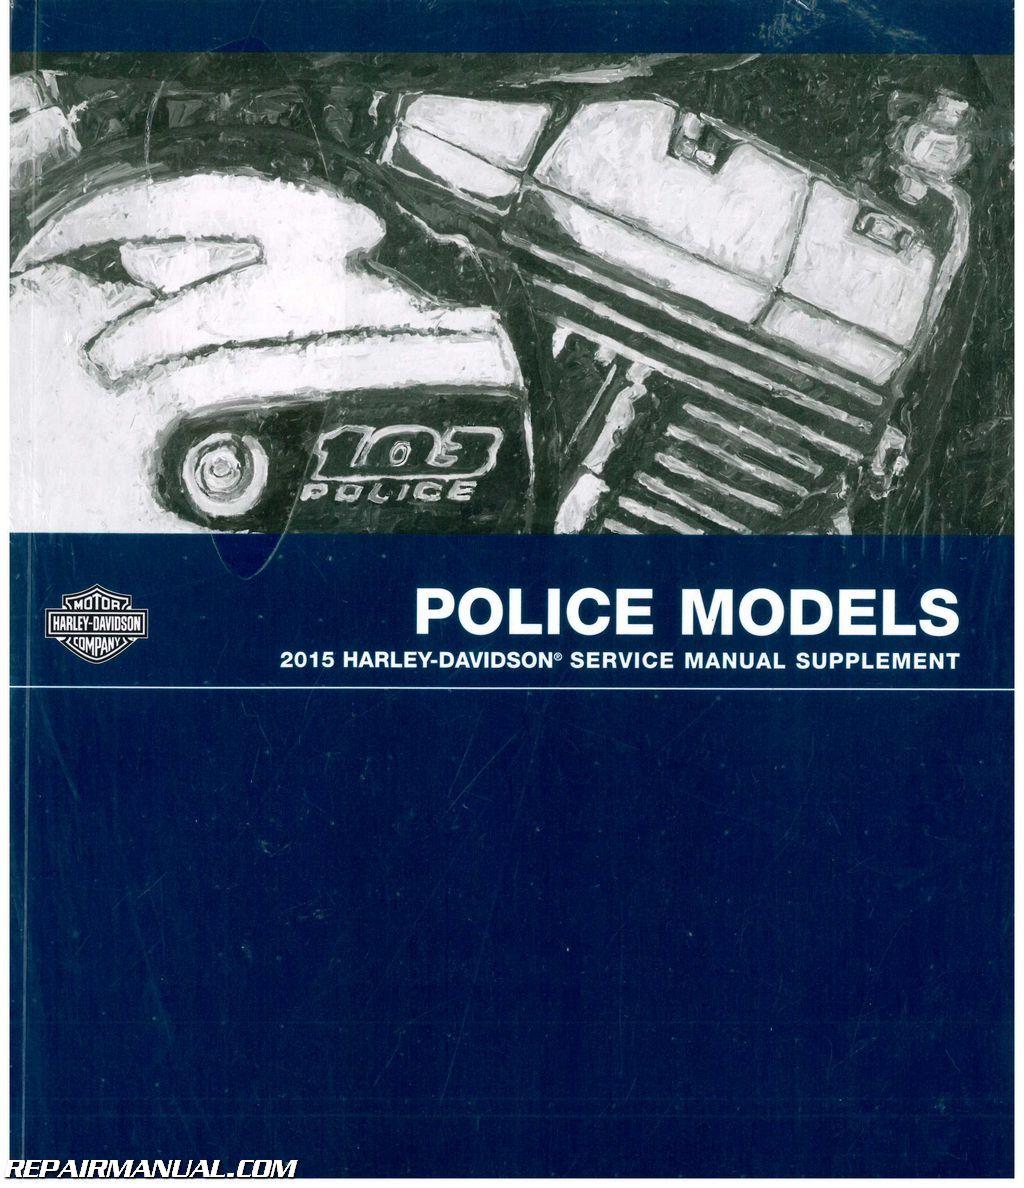 2015 harley davidson service manual